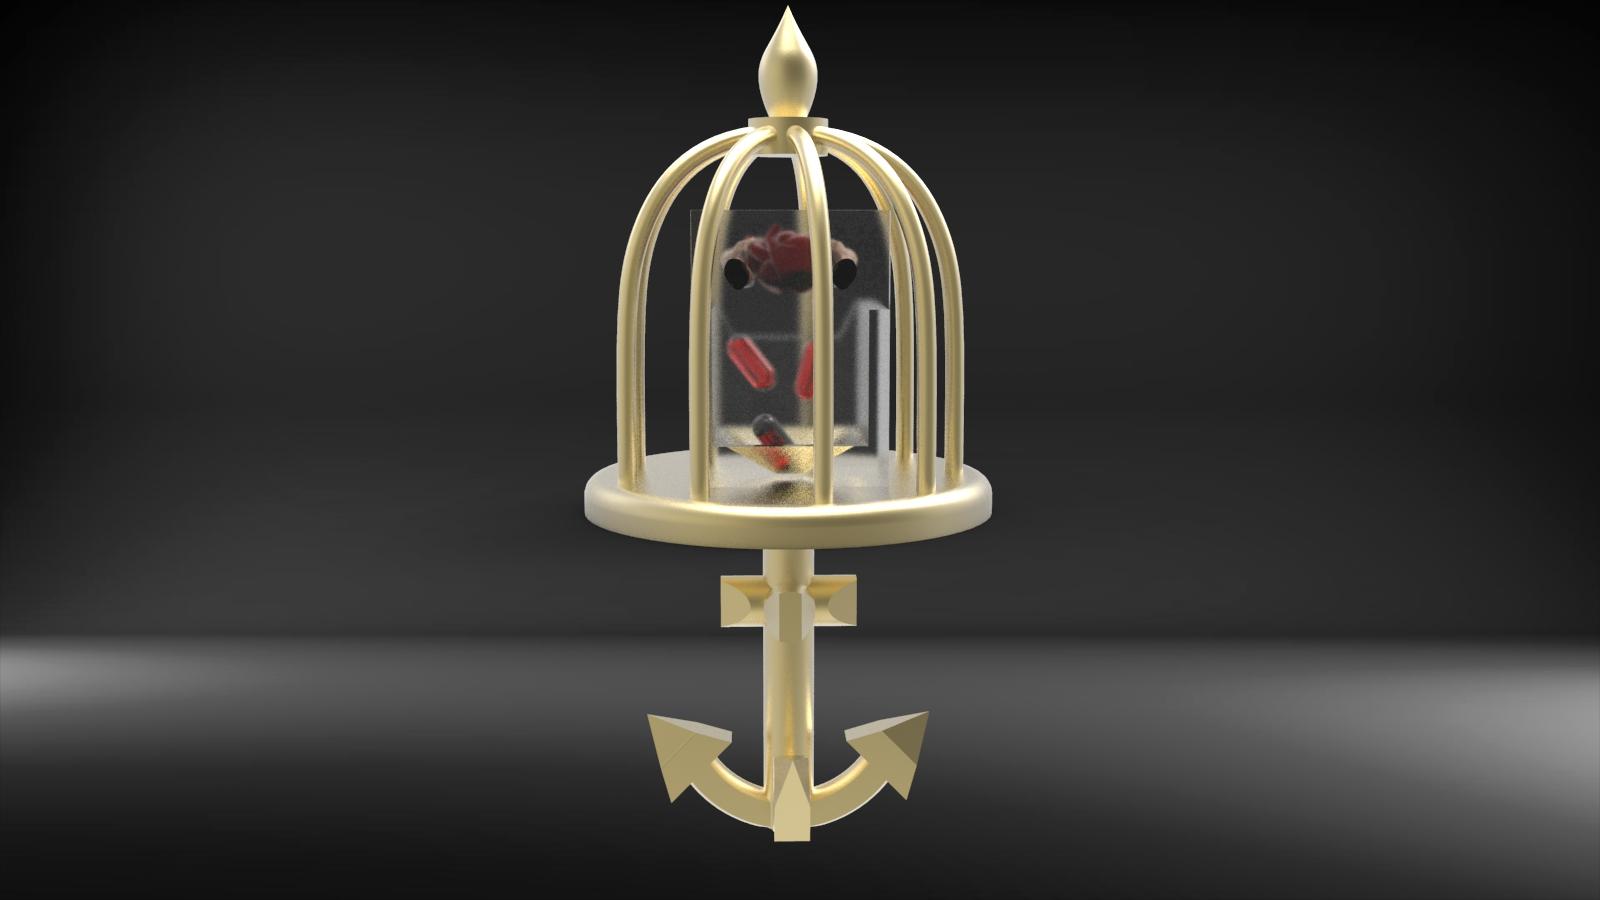 BIRDCAGE.7